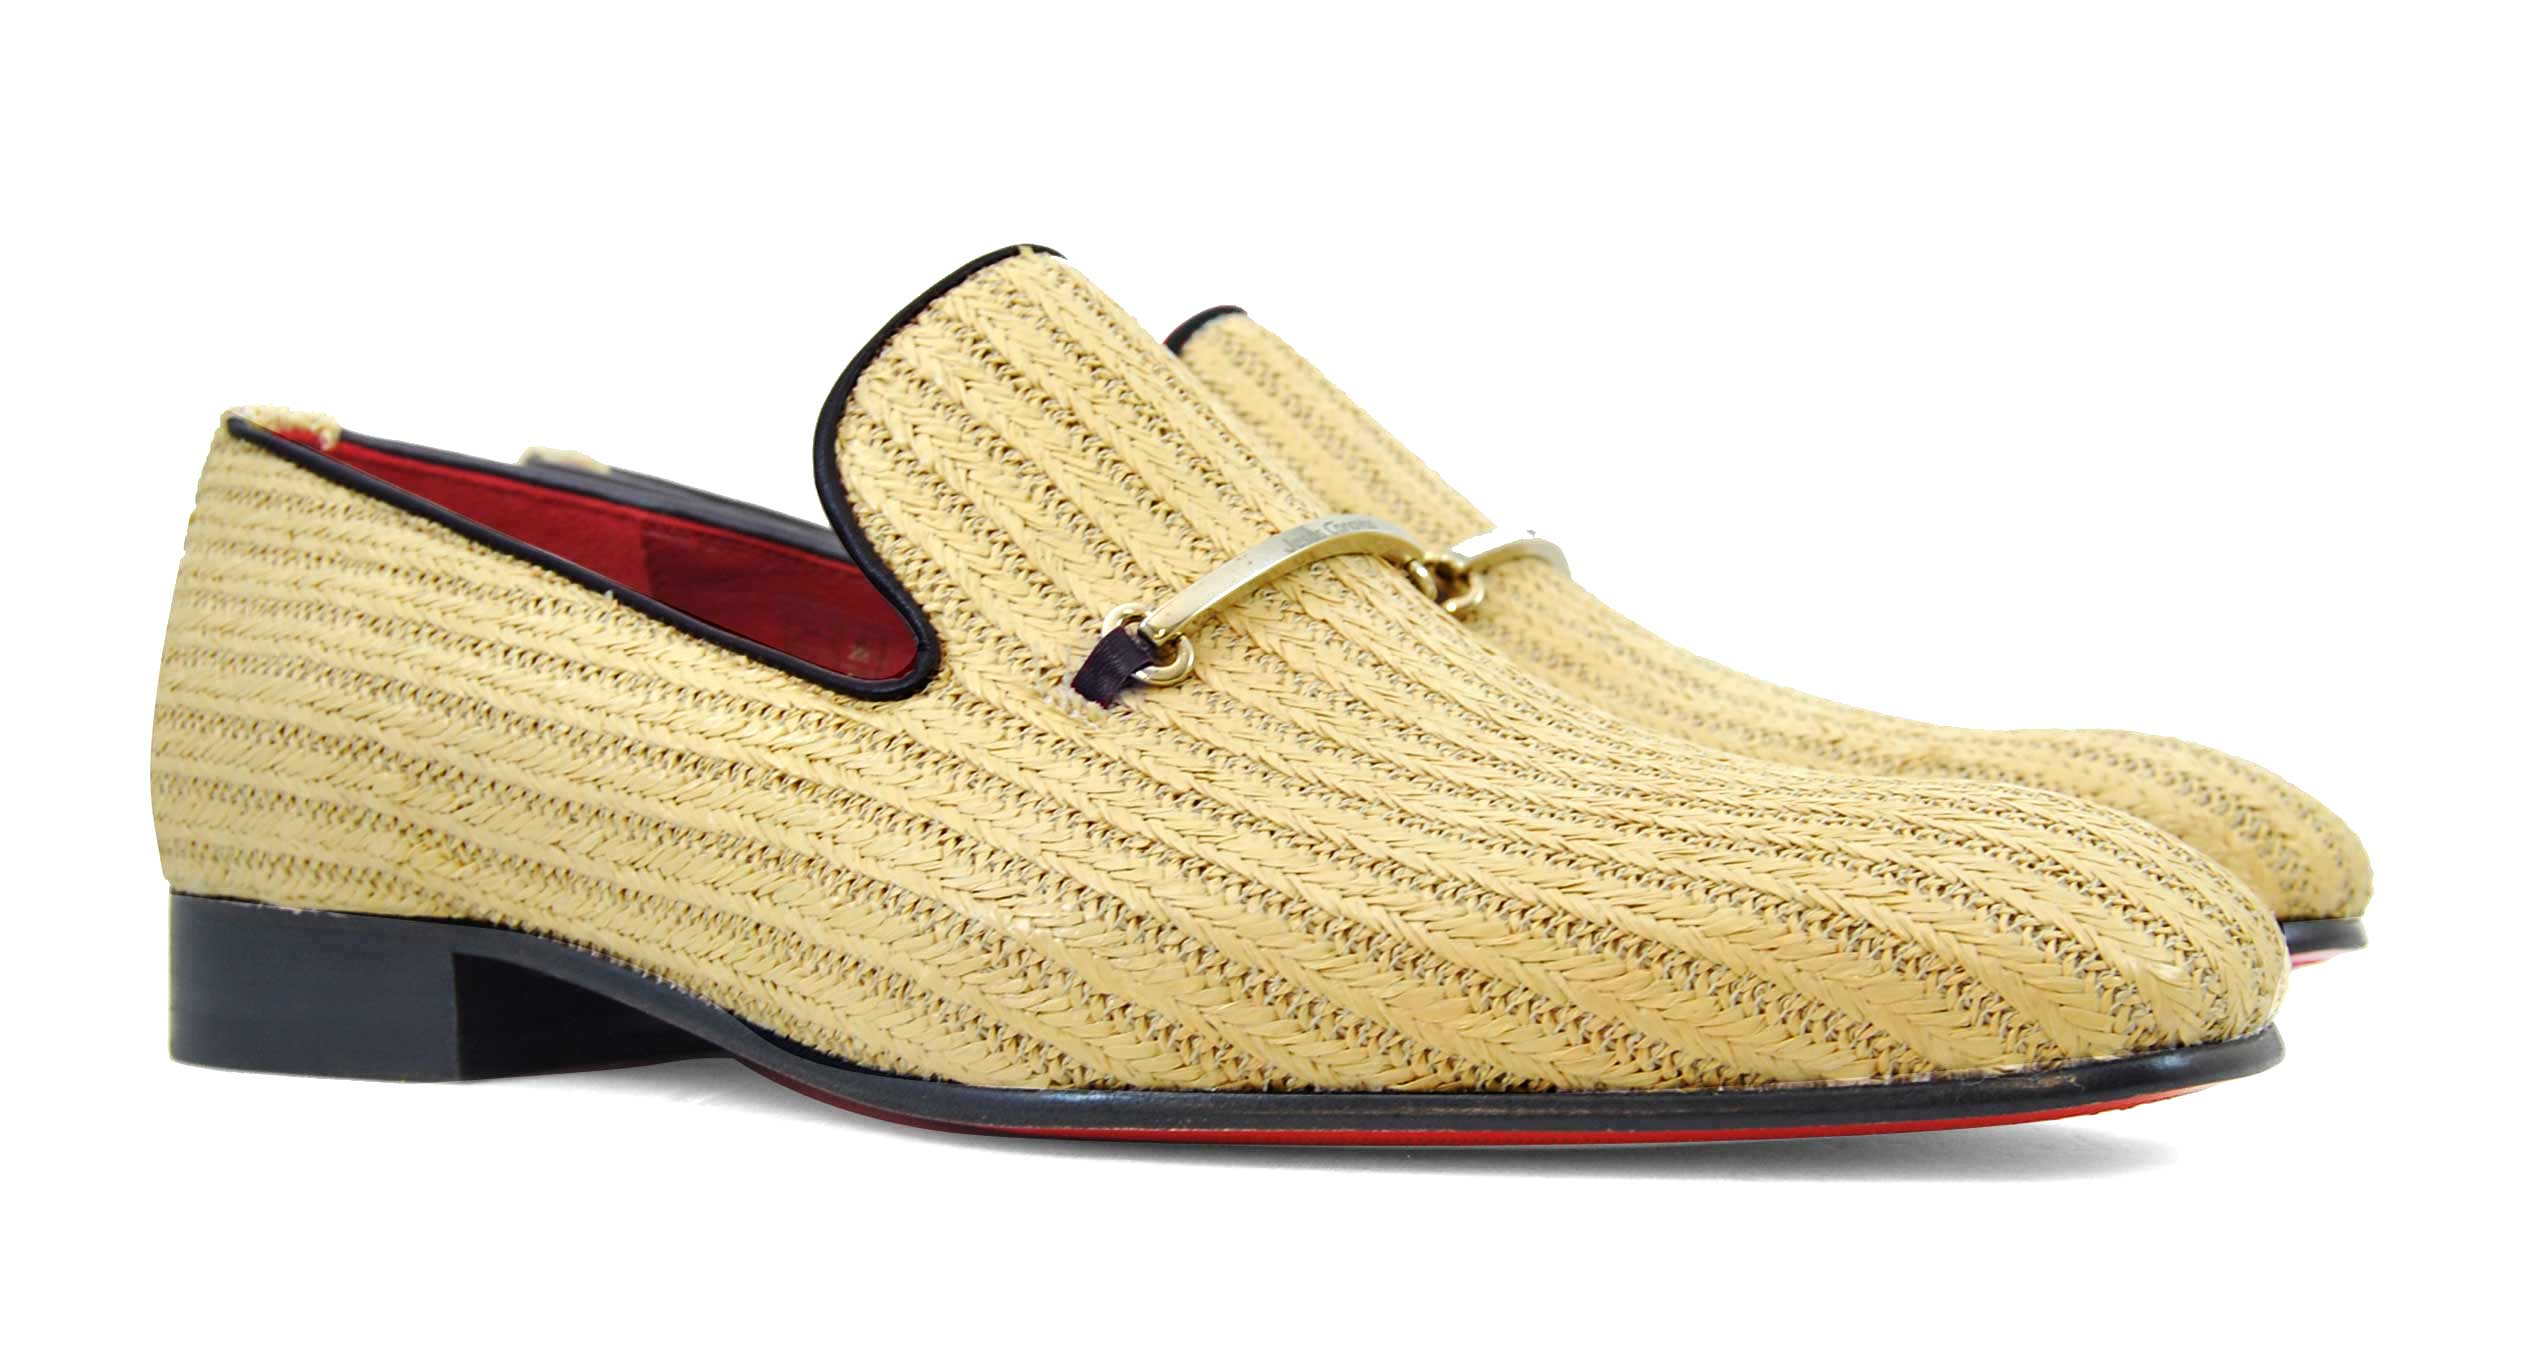 Foto 5 de Zapatos Palma Panameña